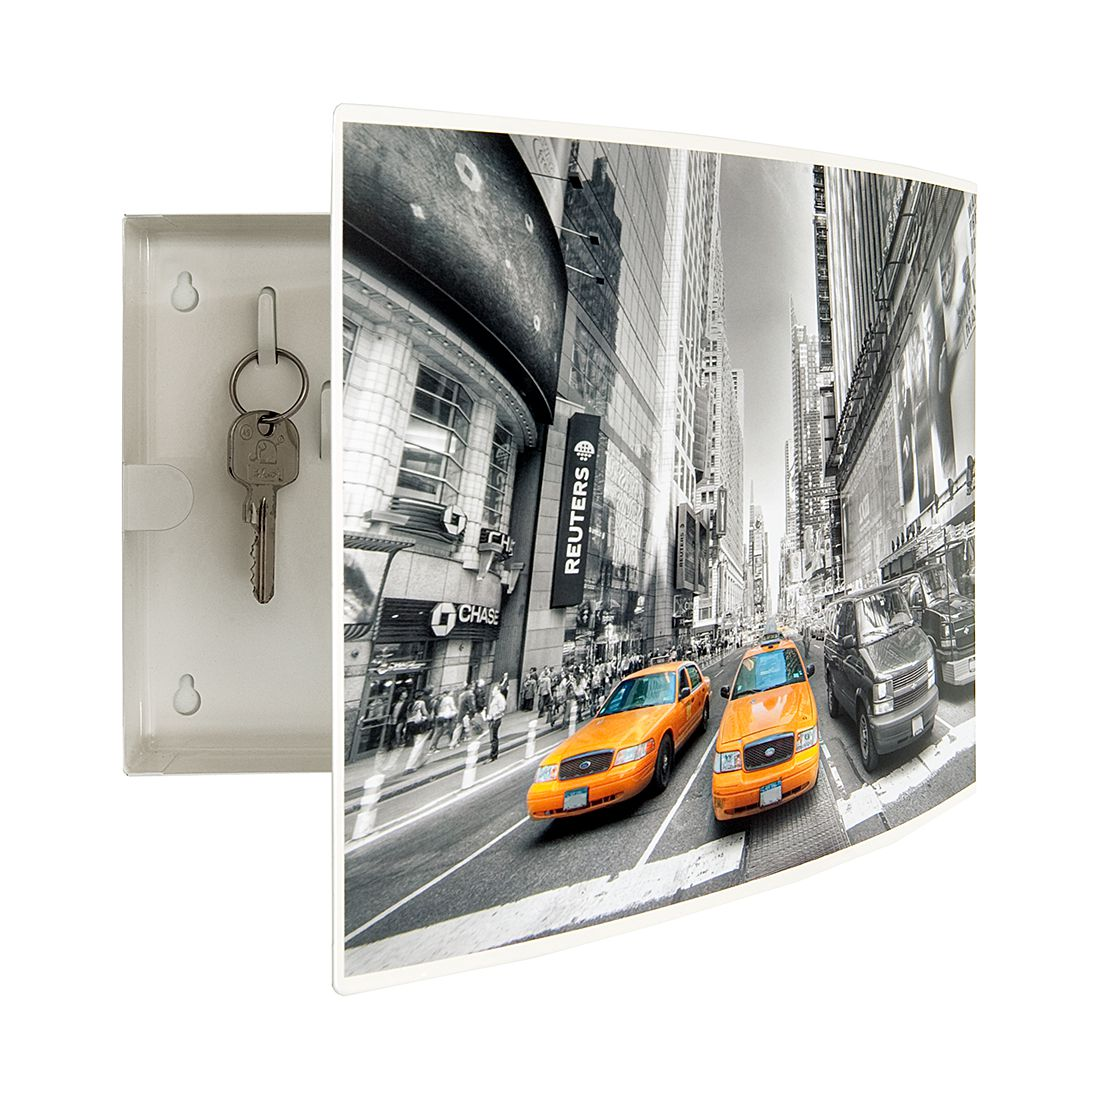 Sleutelkastje City New York - metaal, loftscape